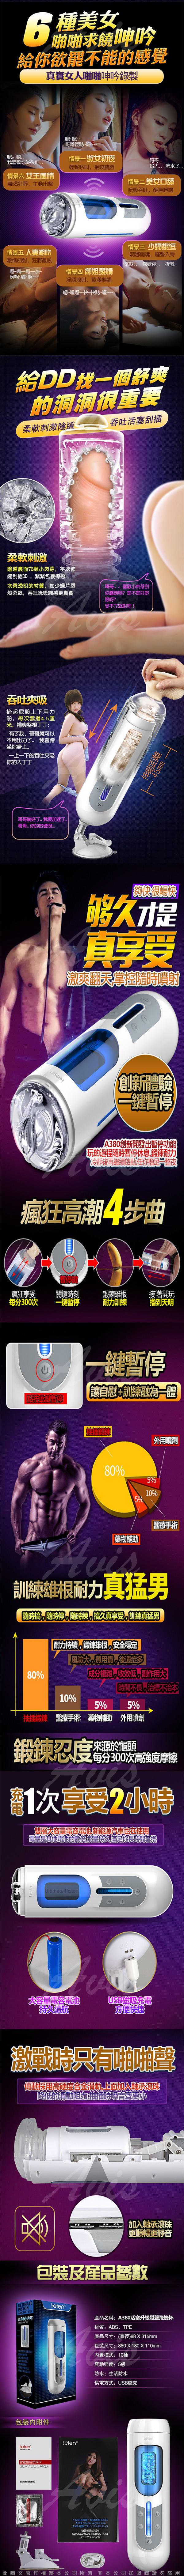 LETEN A380太空艙 銀河戰士第二彈 全自動活塞吸盤自慰杯 磁吸式充電 6位妹妹叫床升級版